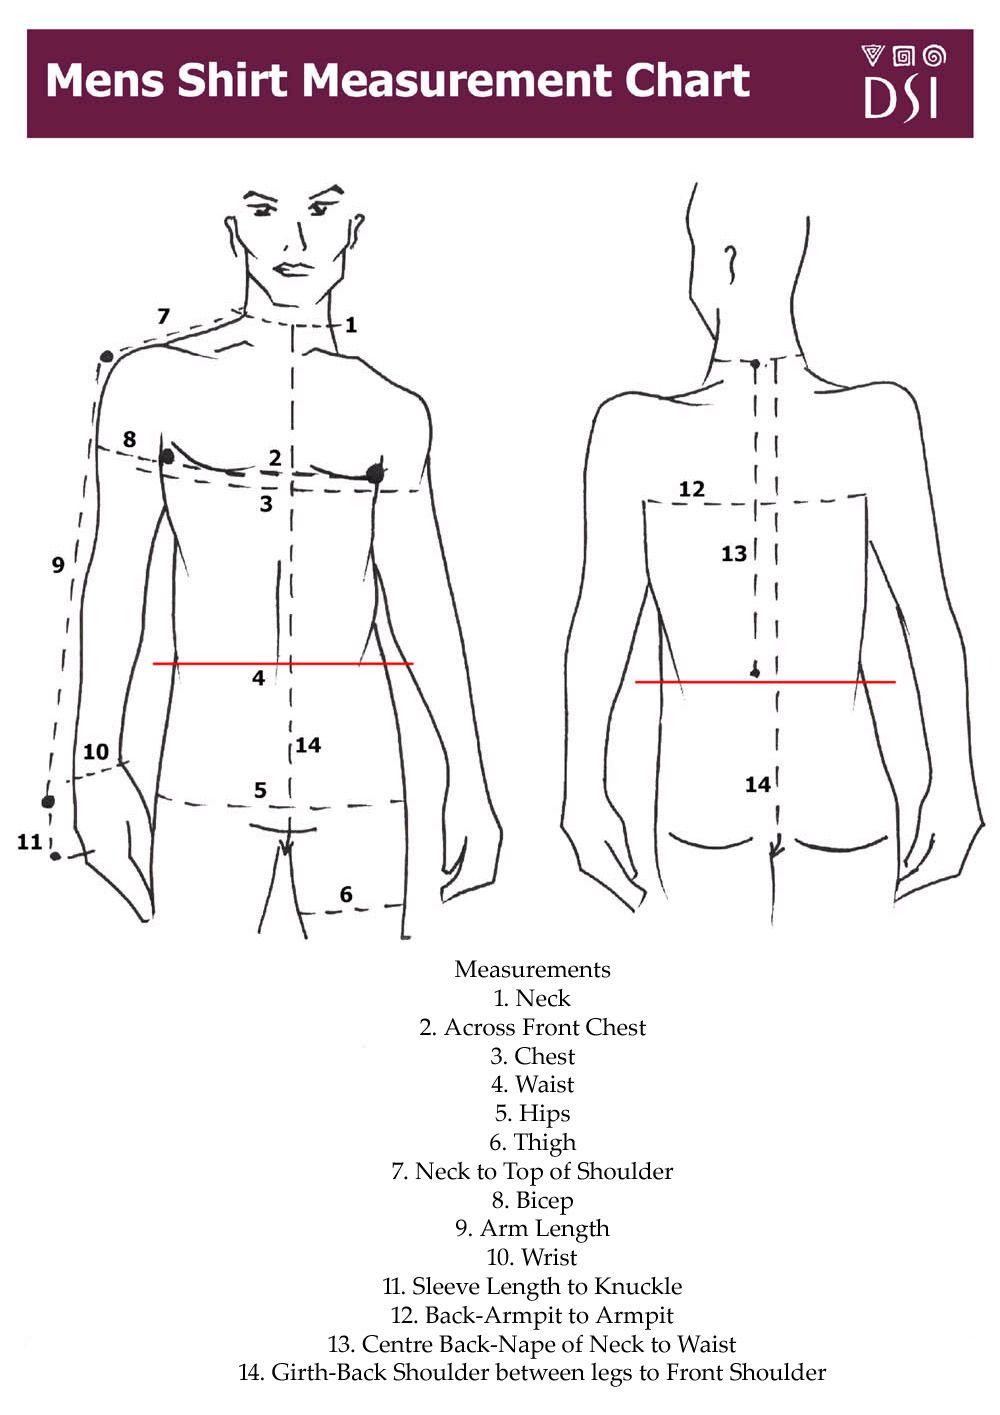 Men's Shirt Measurement Chart | Fashion | Pinterest | Shirts and ...